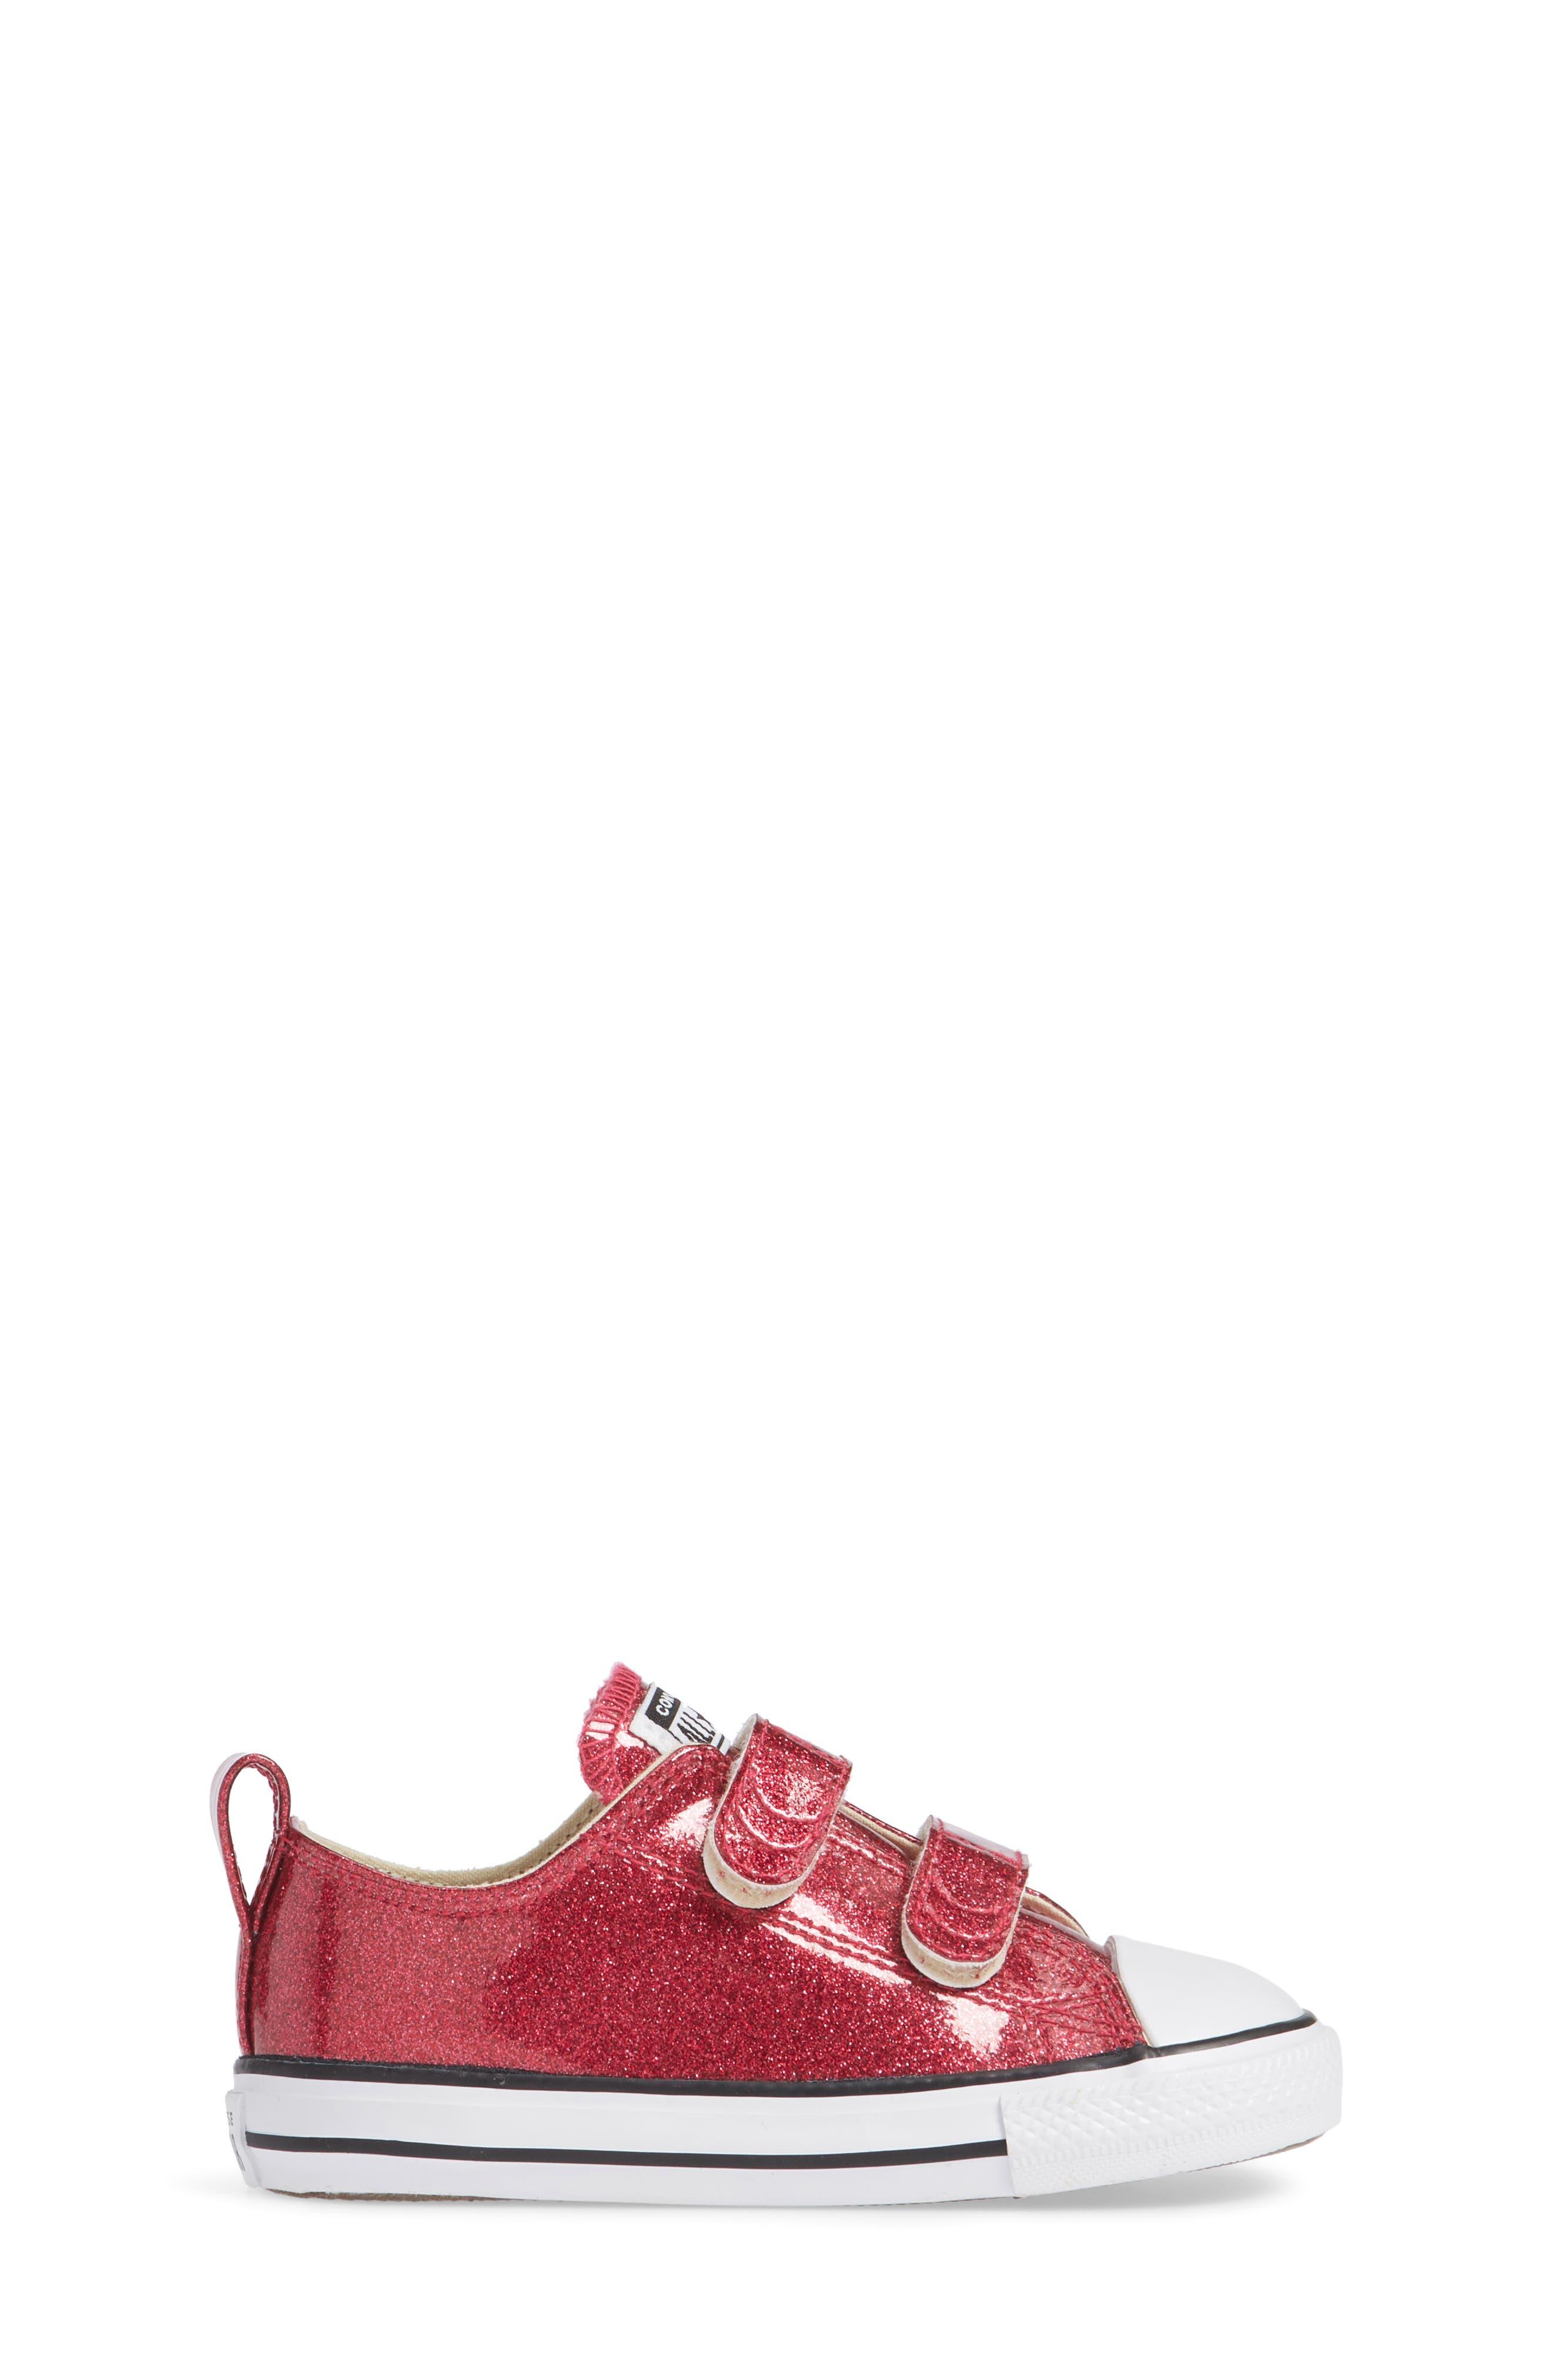 All Star<sup>®</sup> Seasonal Glitter Sneaker,                             Alternate thumbnail 4, color,                             Pink Pop